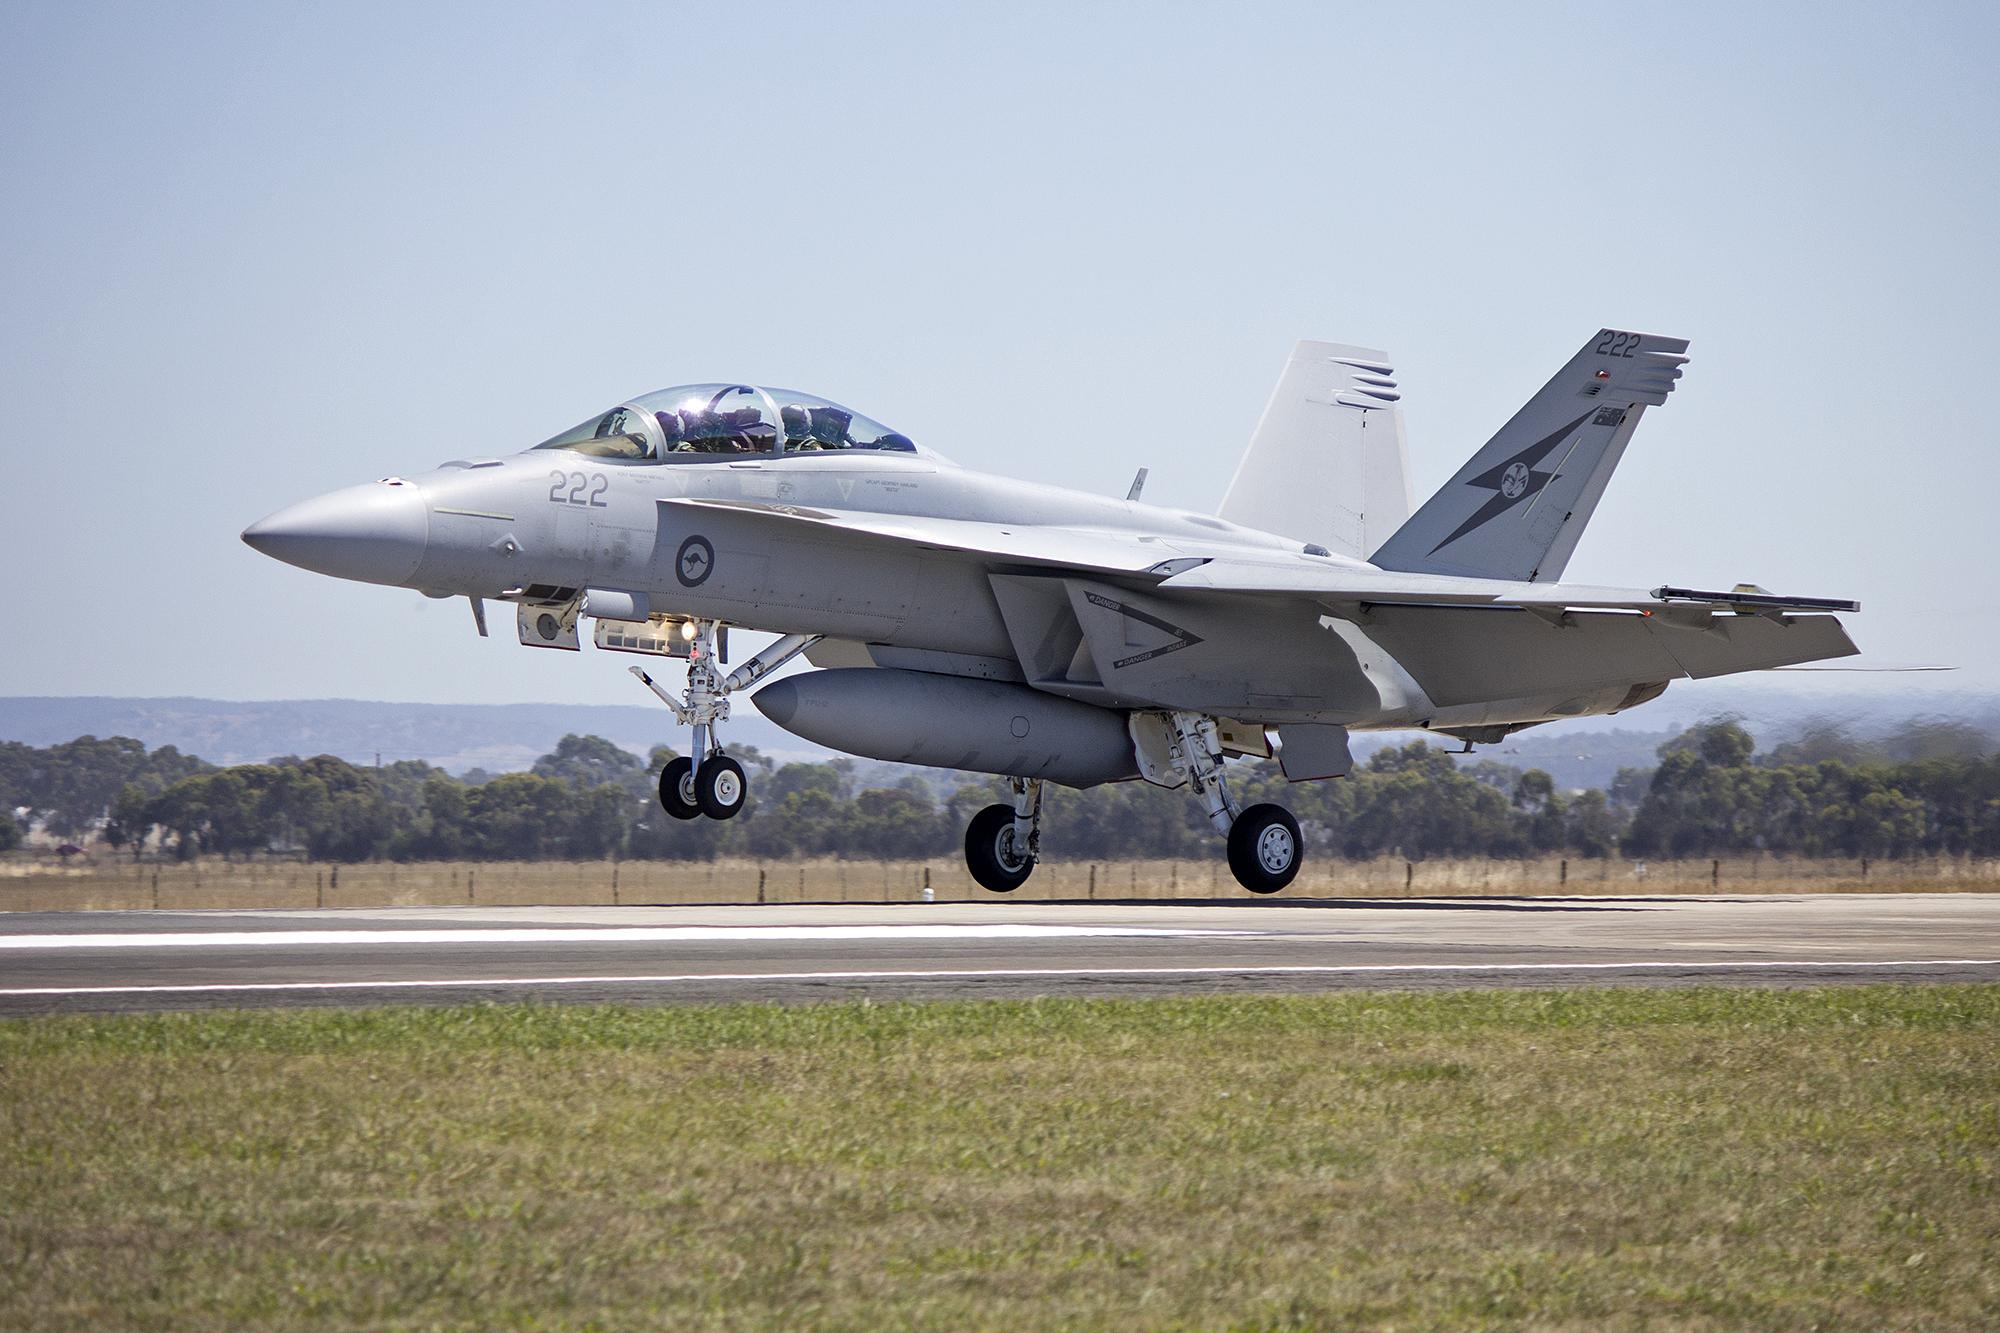 File:RAAF (A44-222) FA 18F Super Hornet landing.jpg - Wikimedia Commons